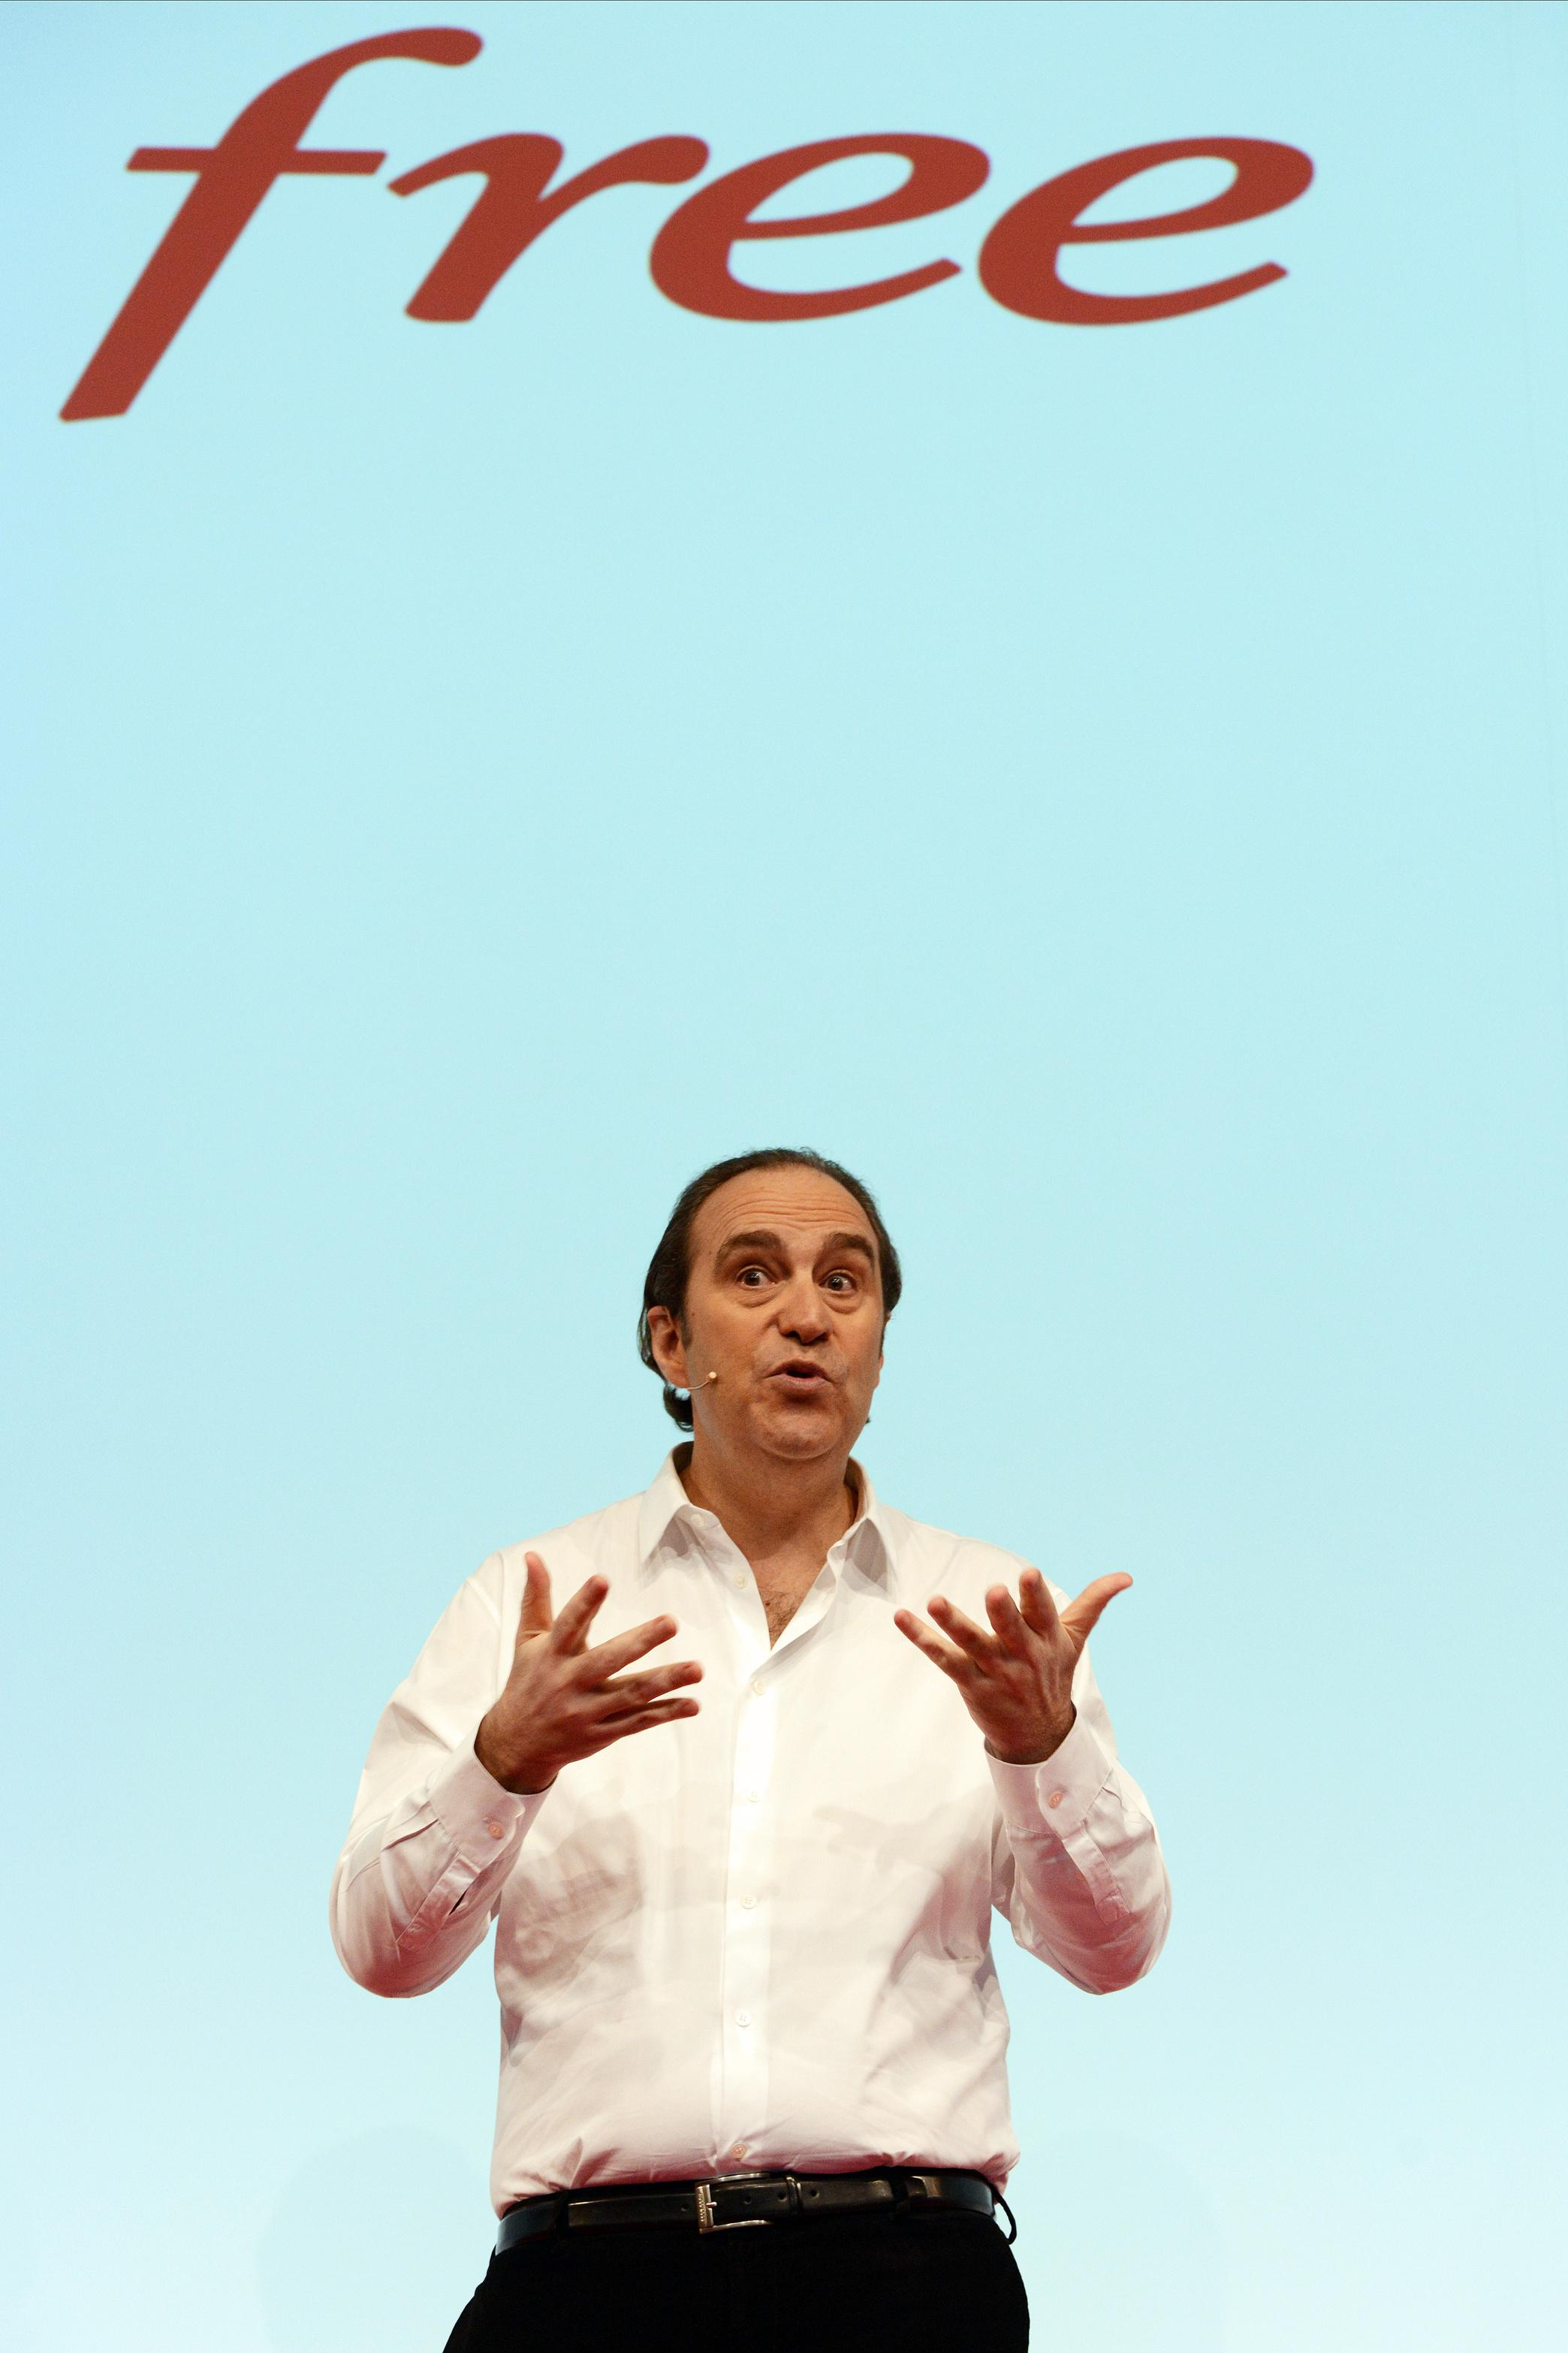 Xavier Niel launches 'Free Box Mini 4k' in Paris